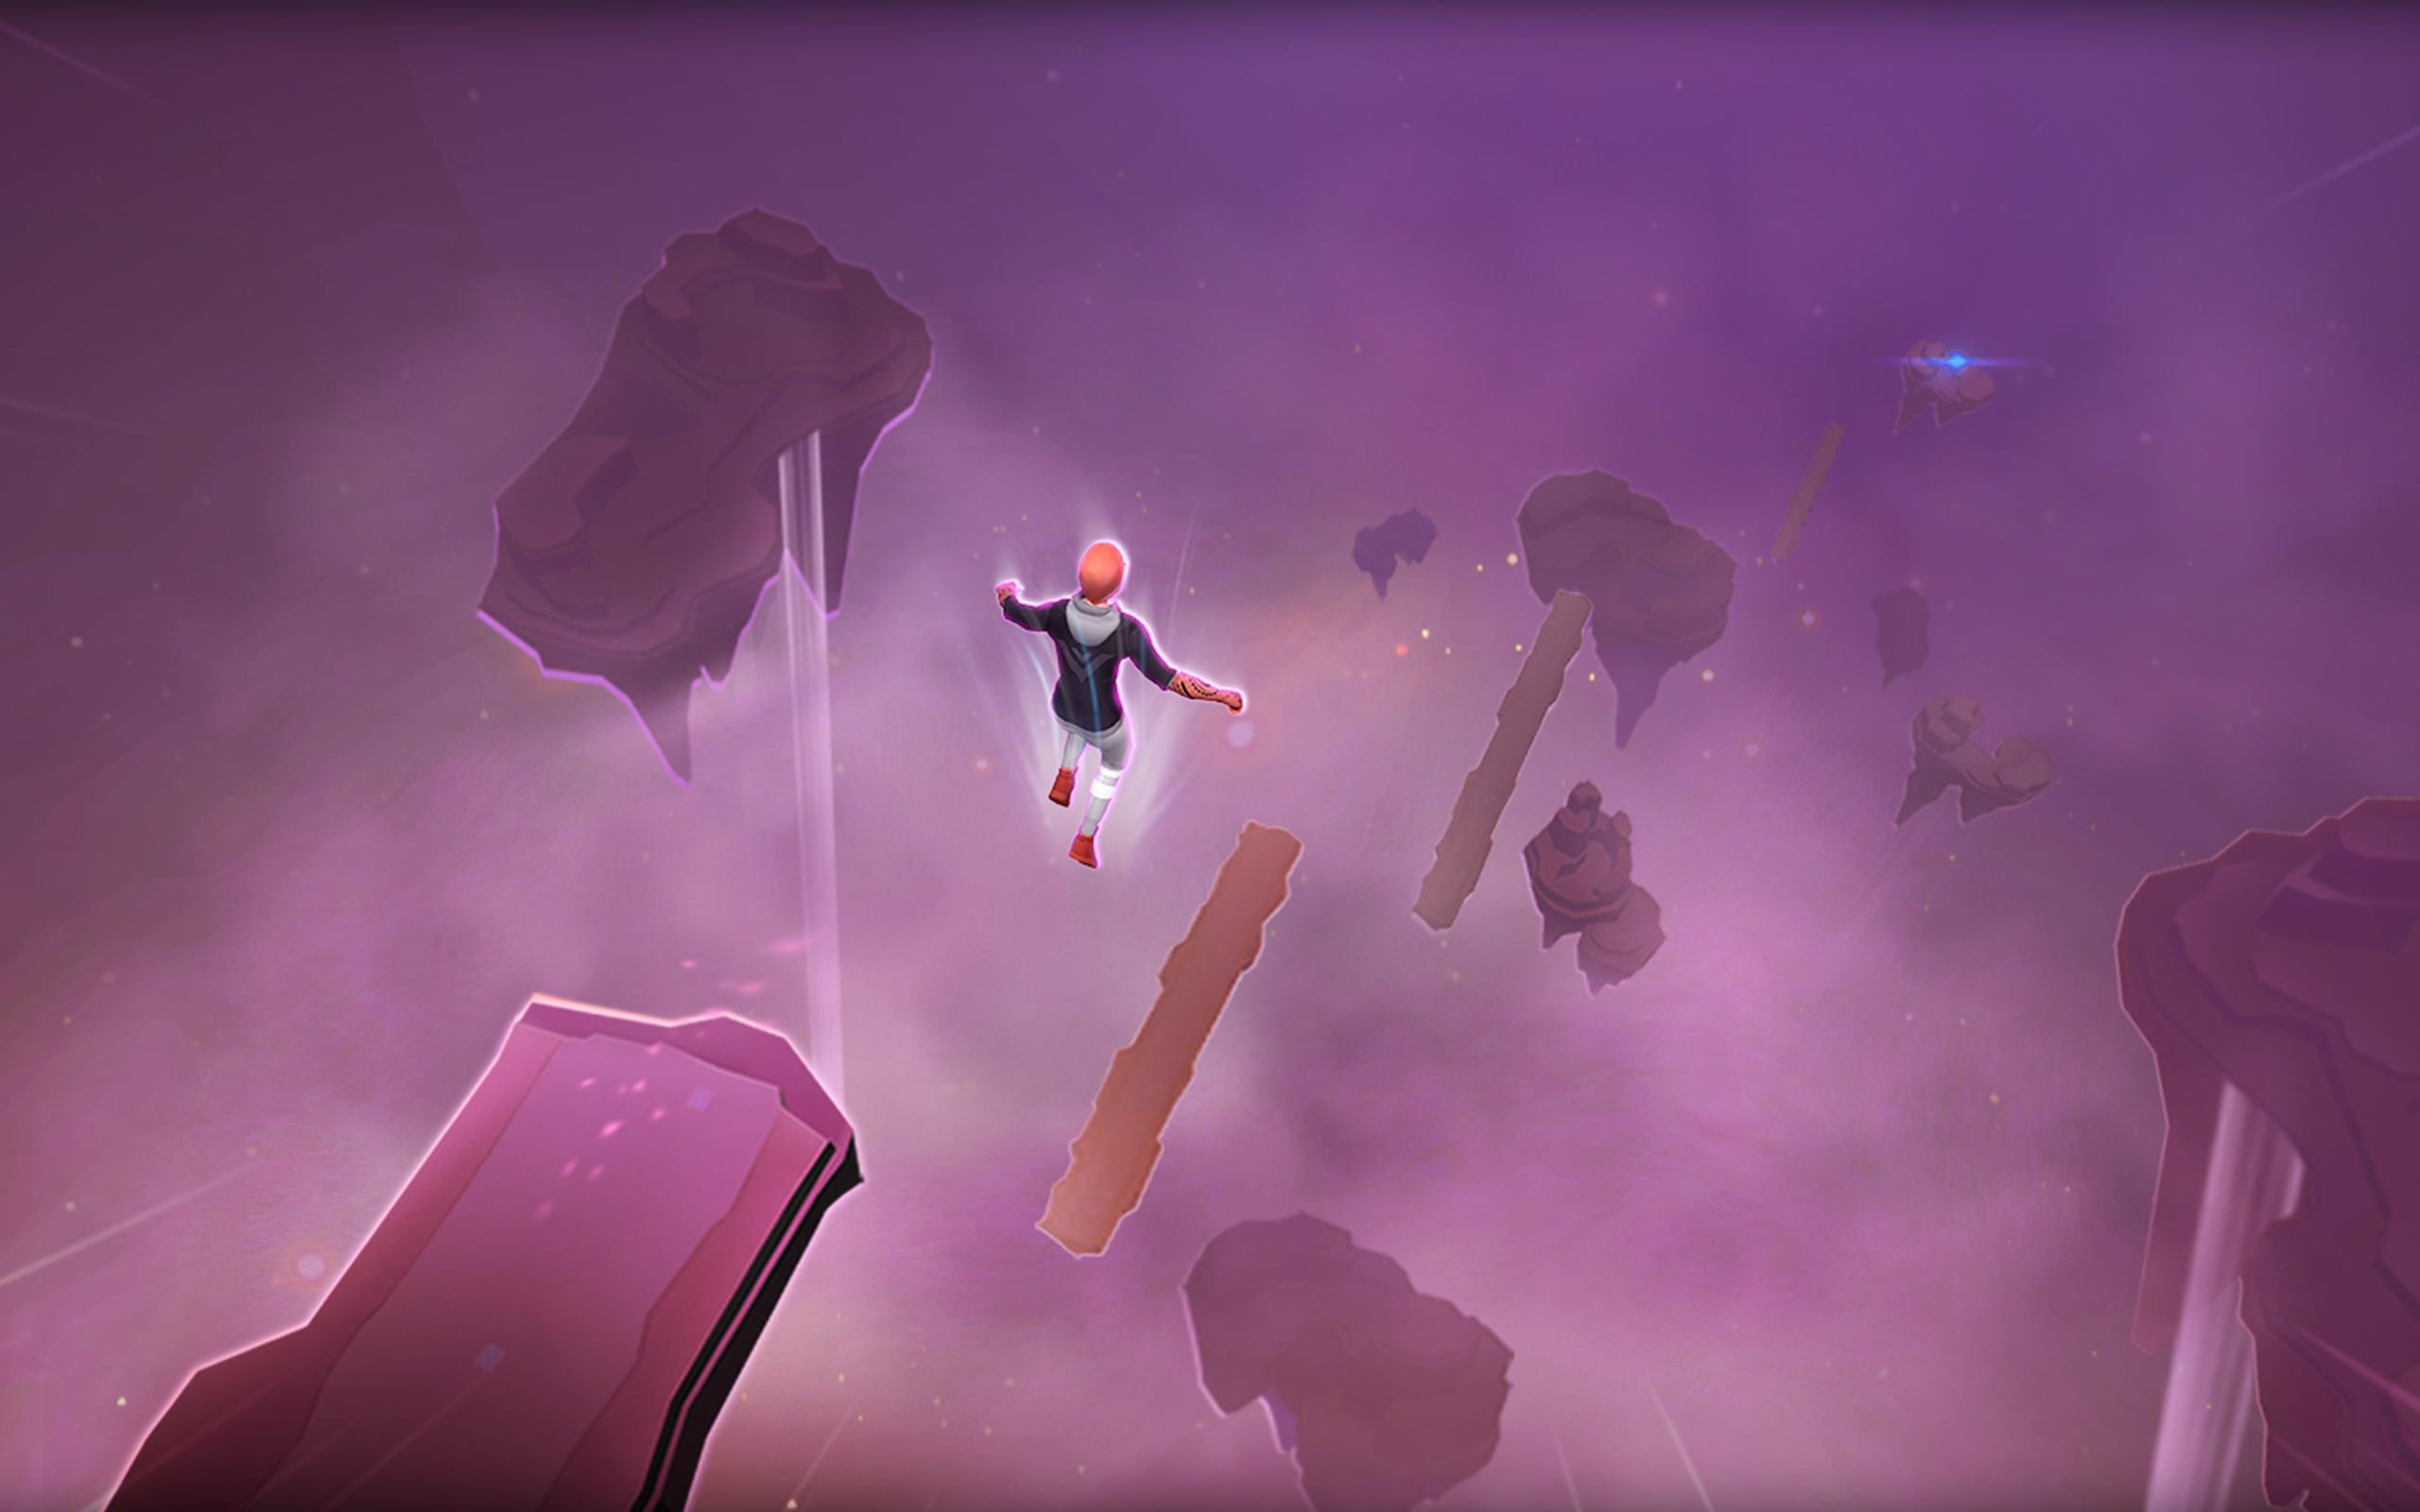 Sky Dancer Run - Running Game 4.2.0 Screenshot 13